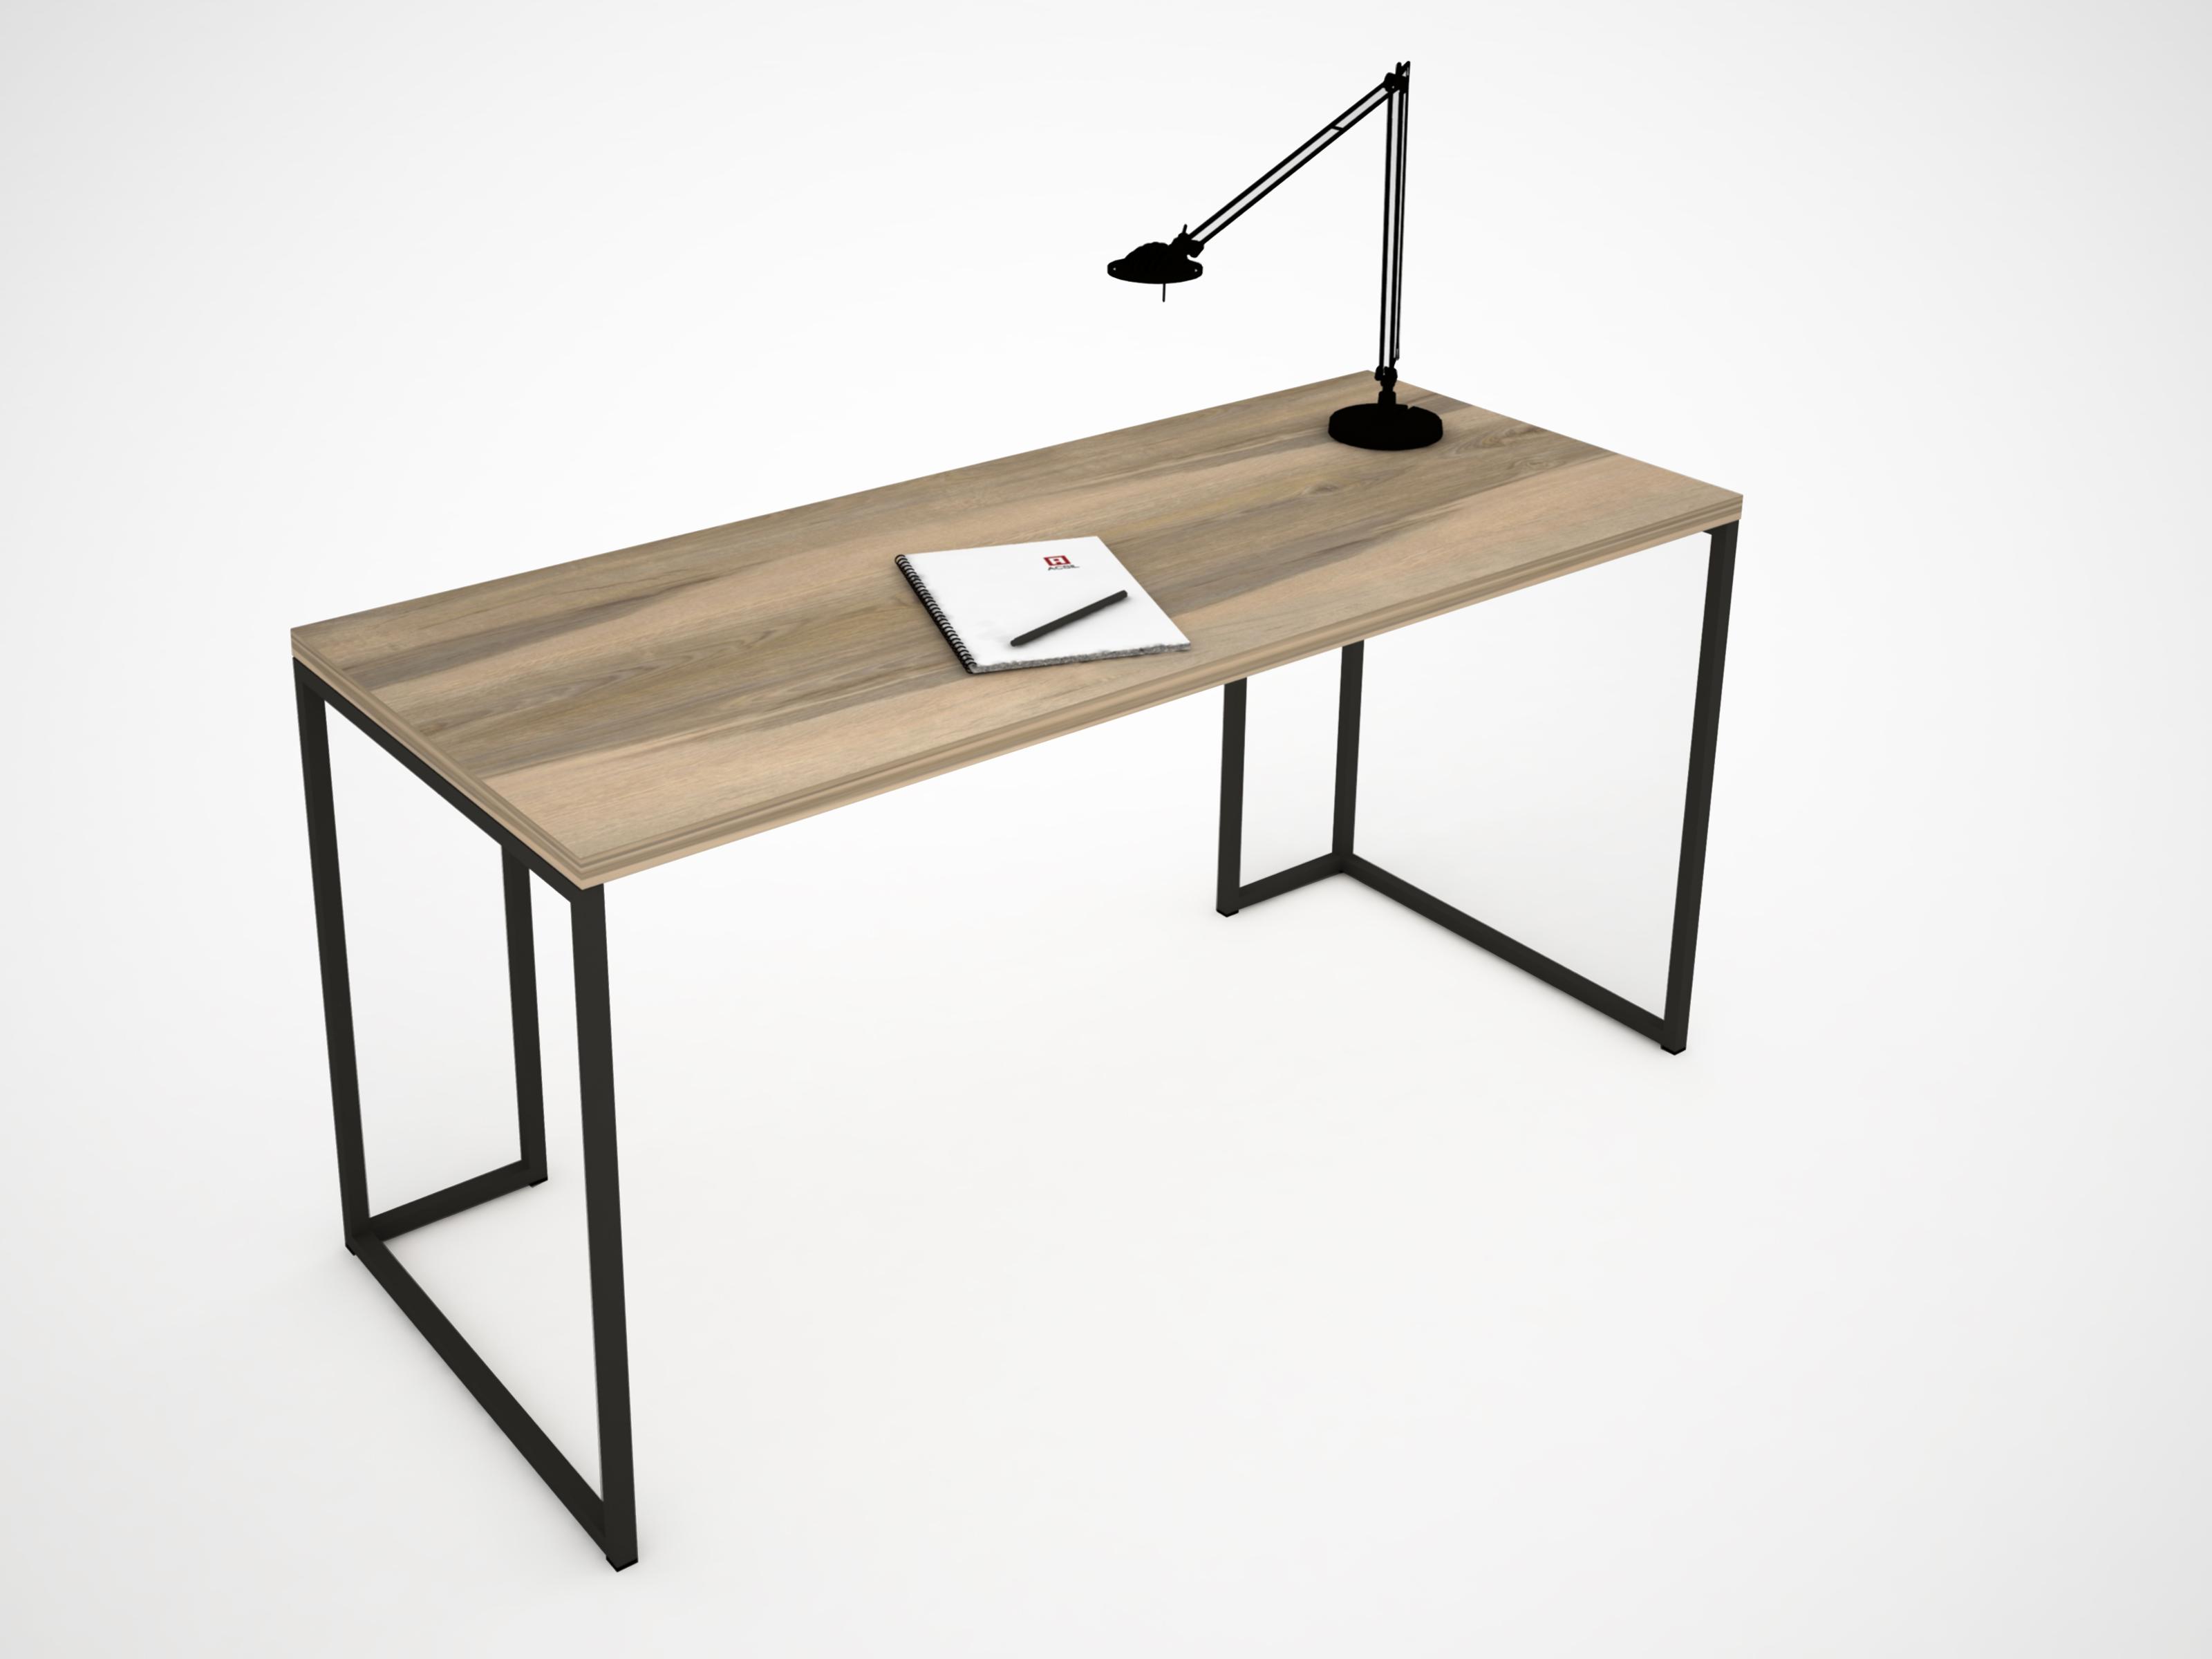 Mesas de estudio olut for Mesas de estudio para espacios pequenos